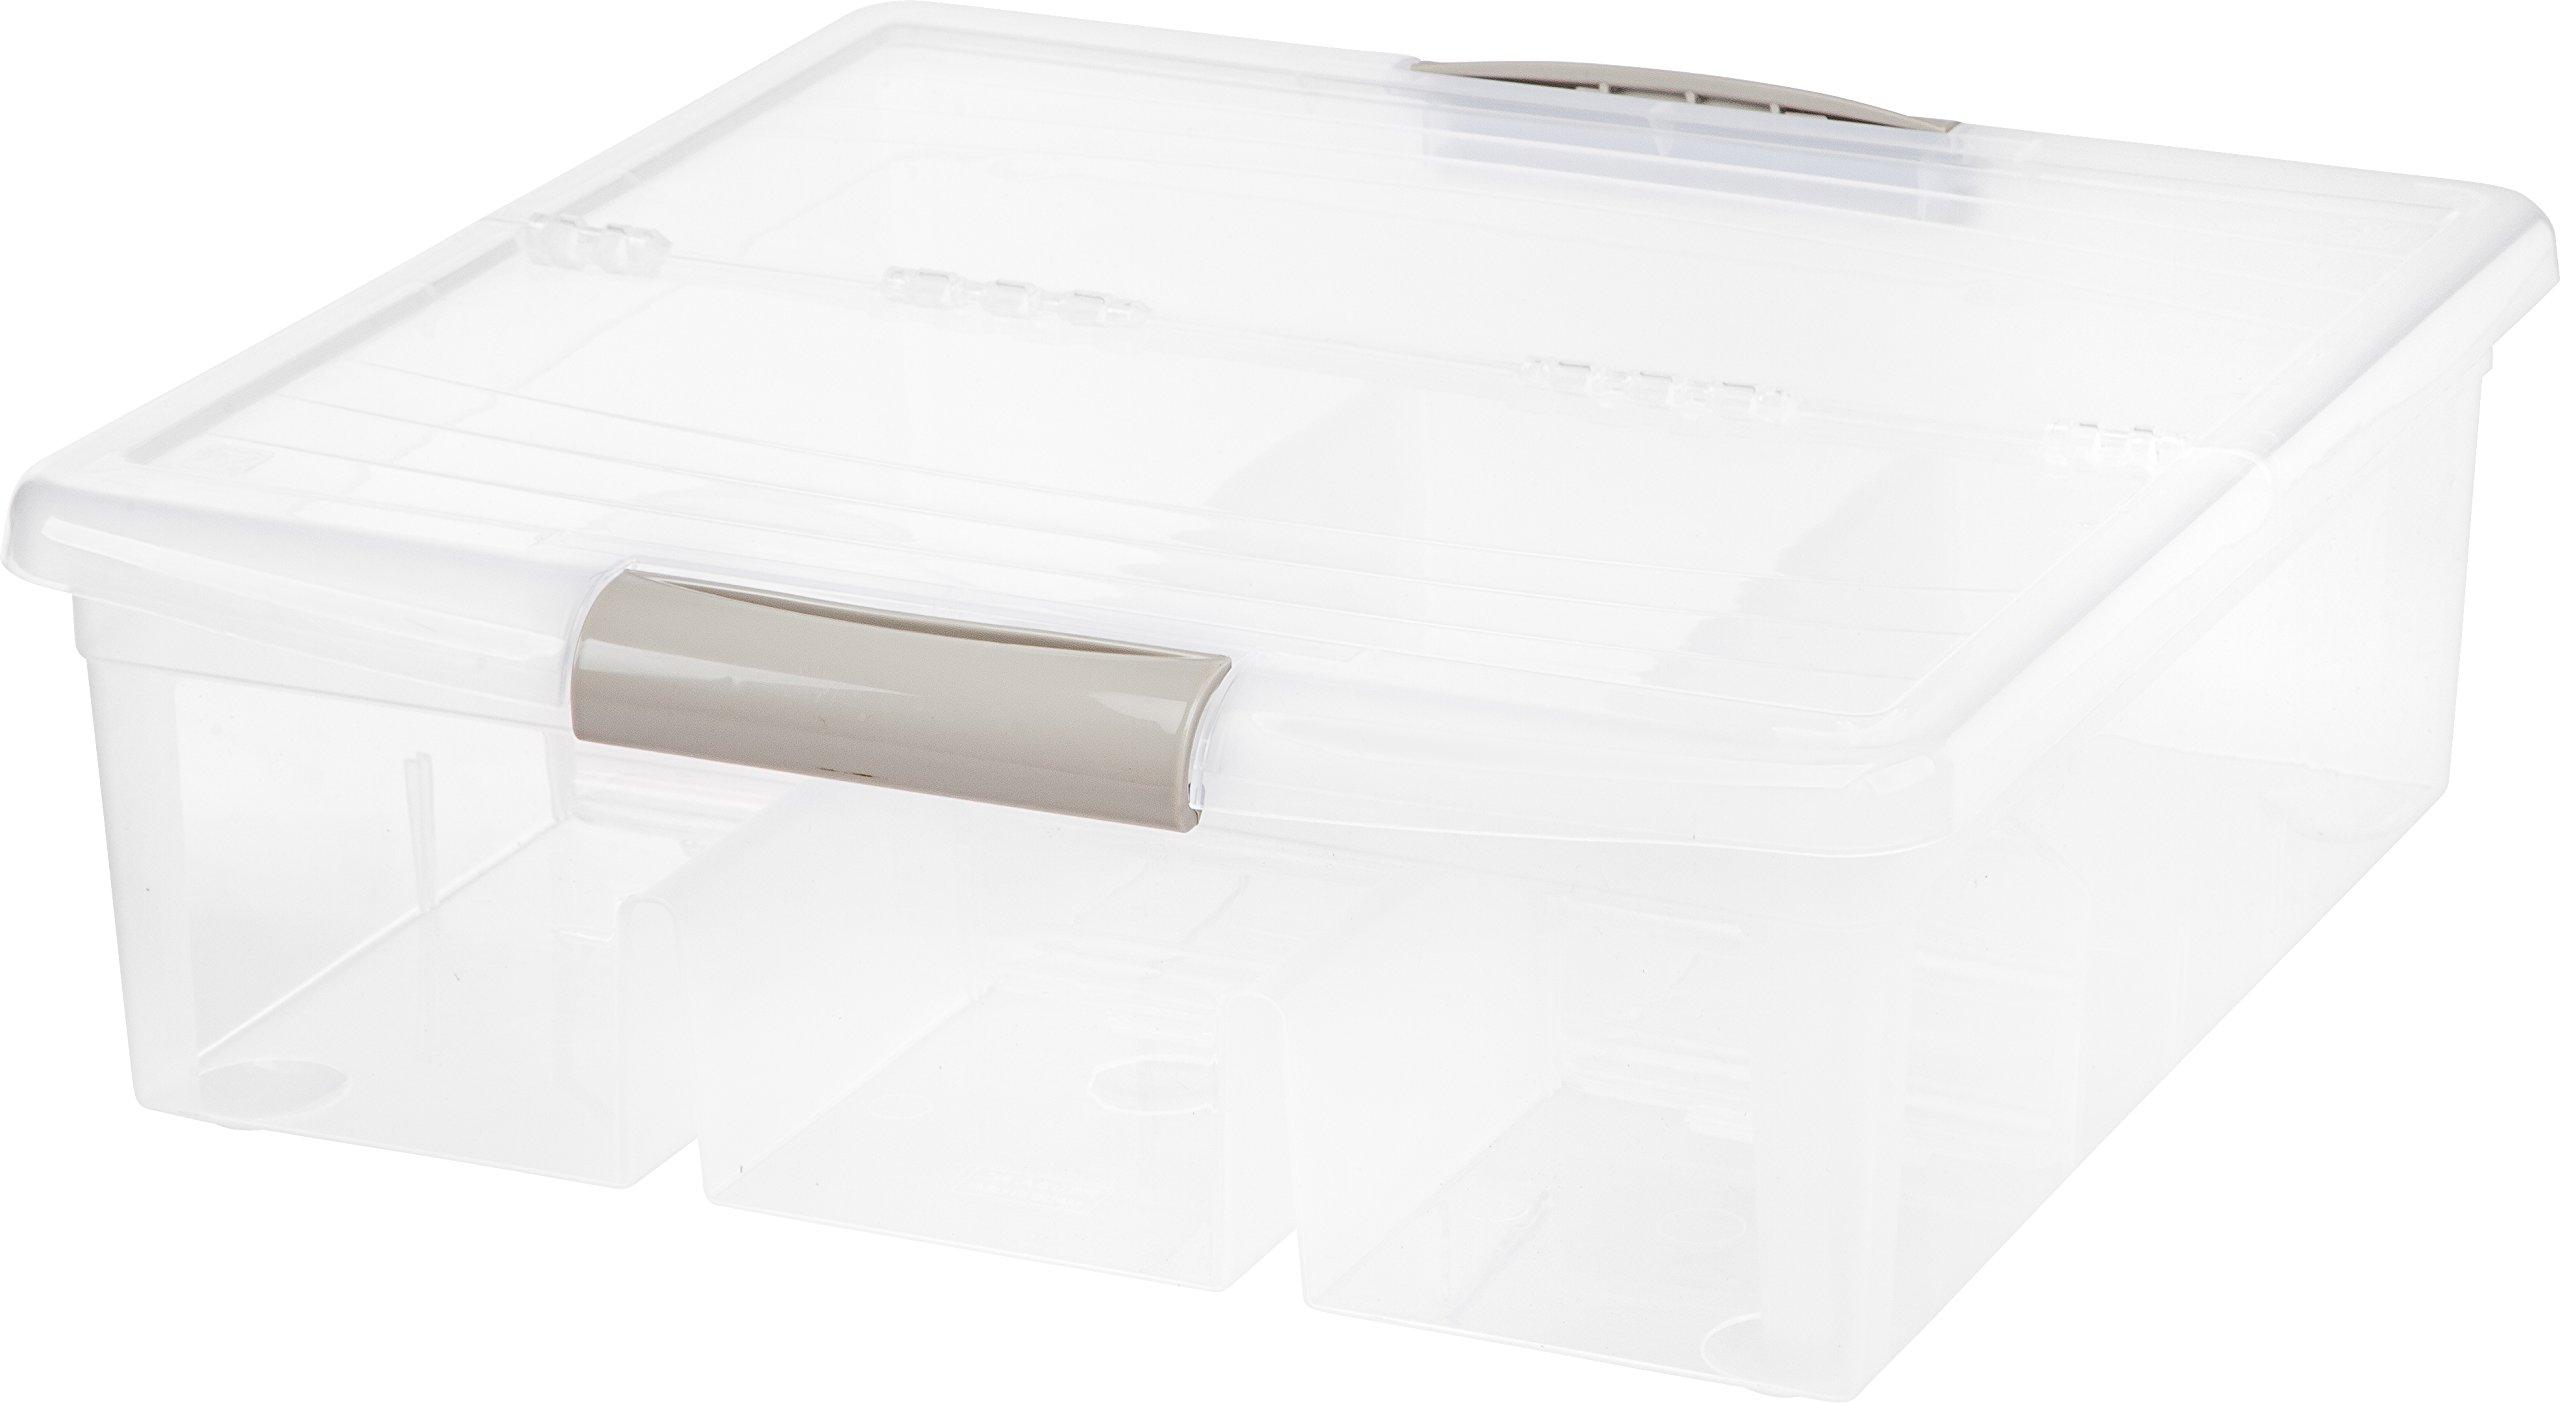 IRIS Large Divided Media Storage Box, Clear by IRIS USA, Inc. (Image #1)